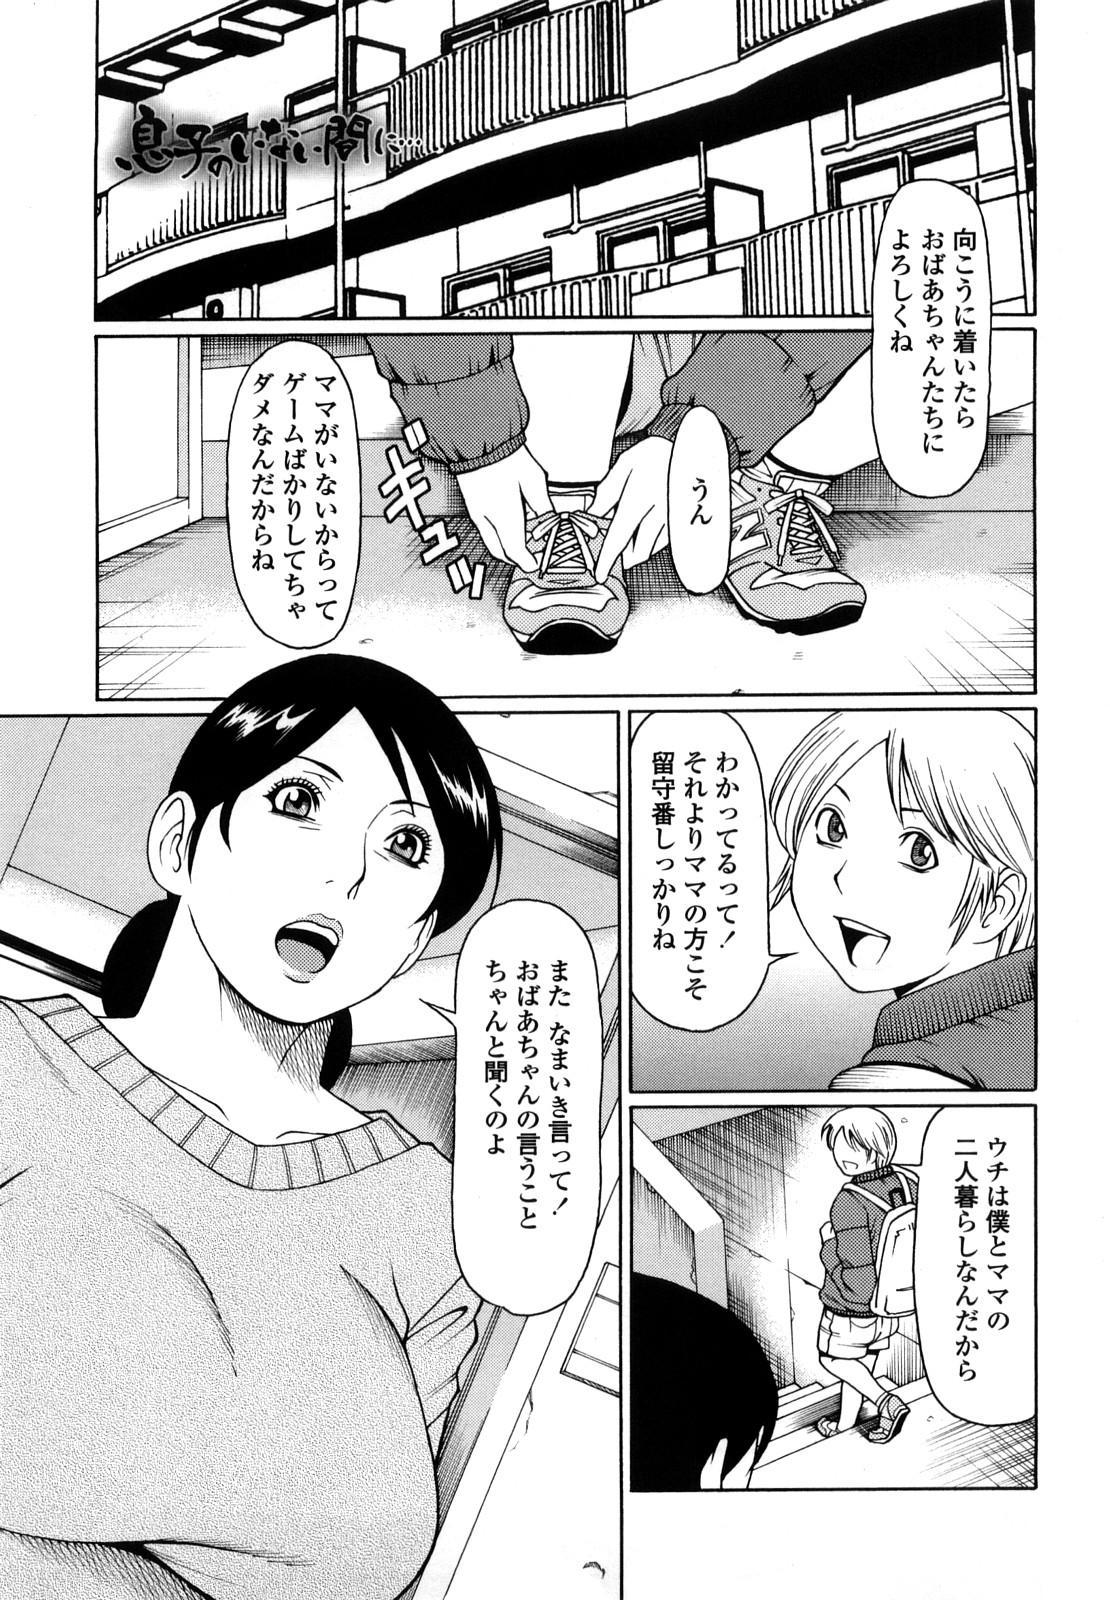 [Takasugi Kou] Kindan no Haha-Ana - Immorality Love-Hole [Decensored] 58